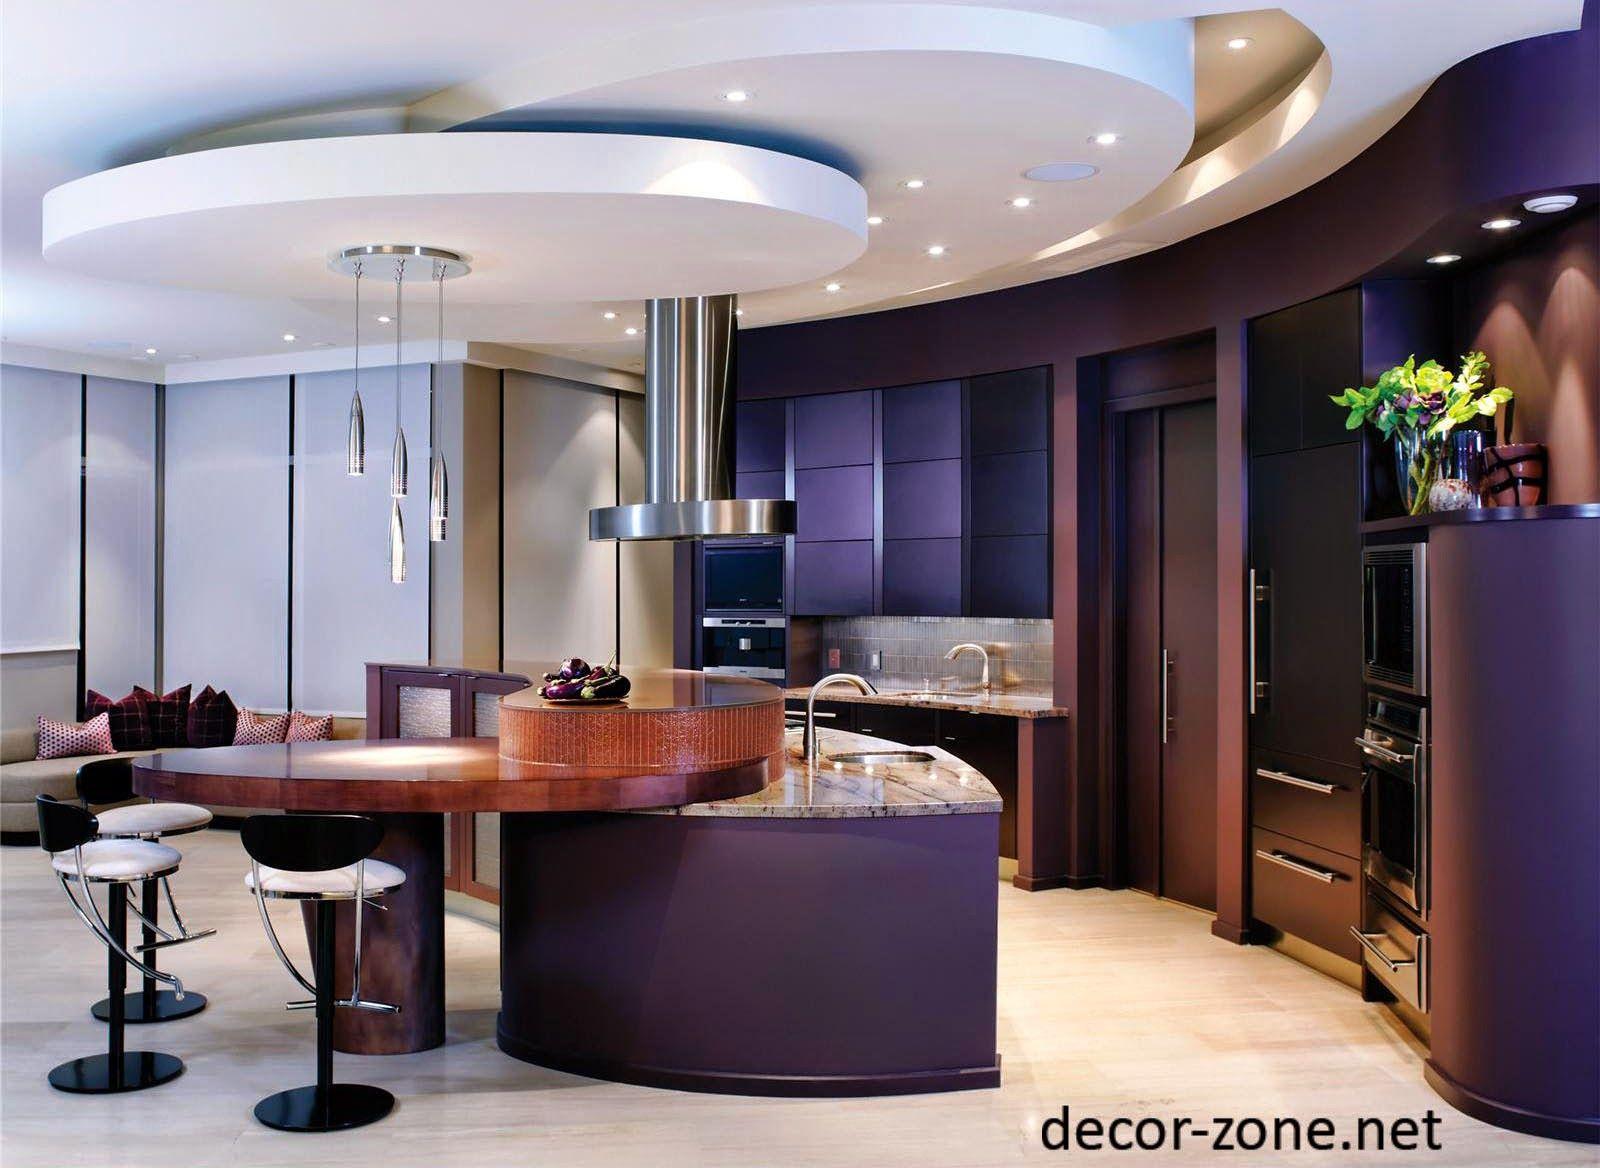 kitchen ceiling ideas, gypsum false ceiling designs   futuristic